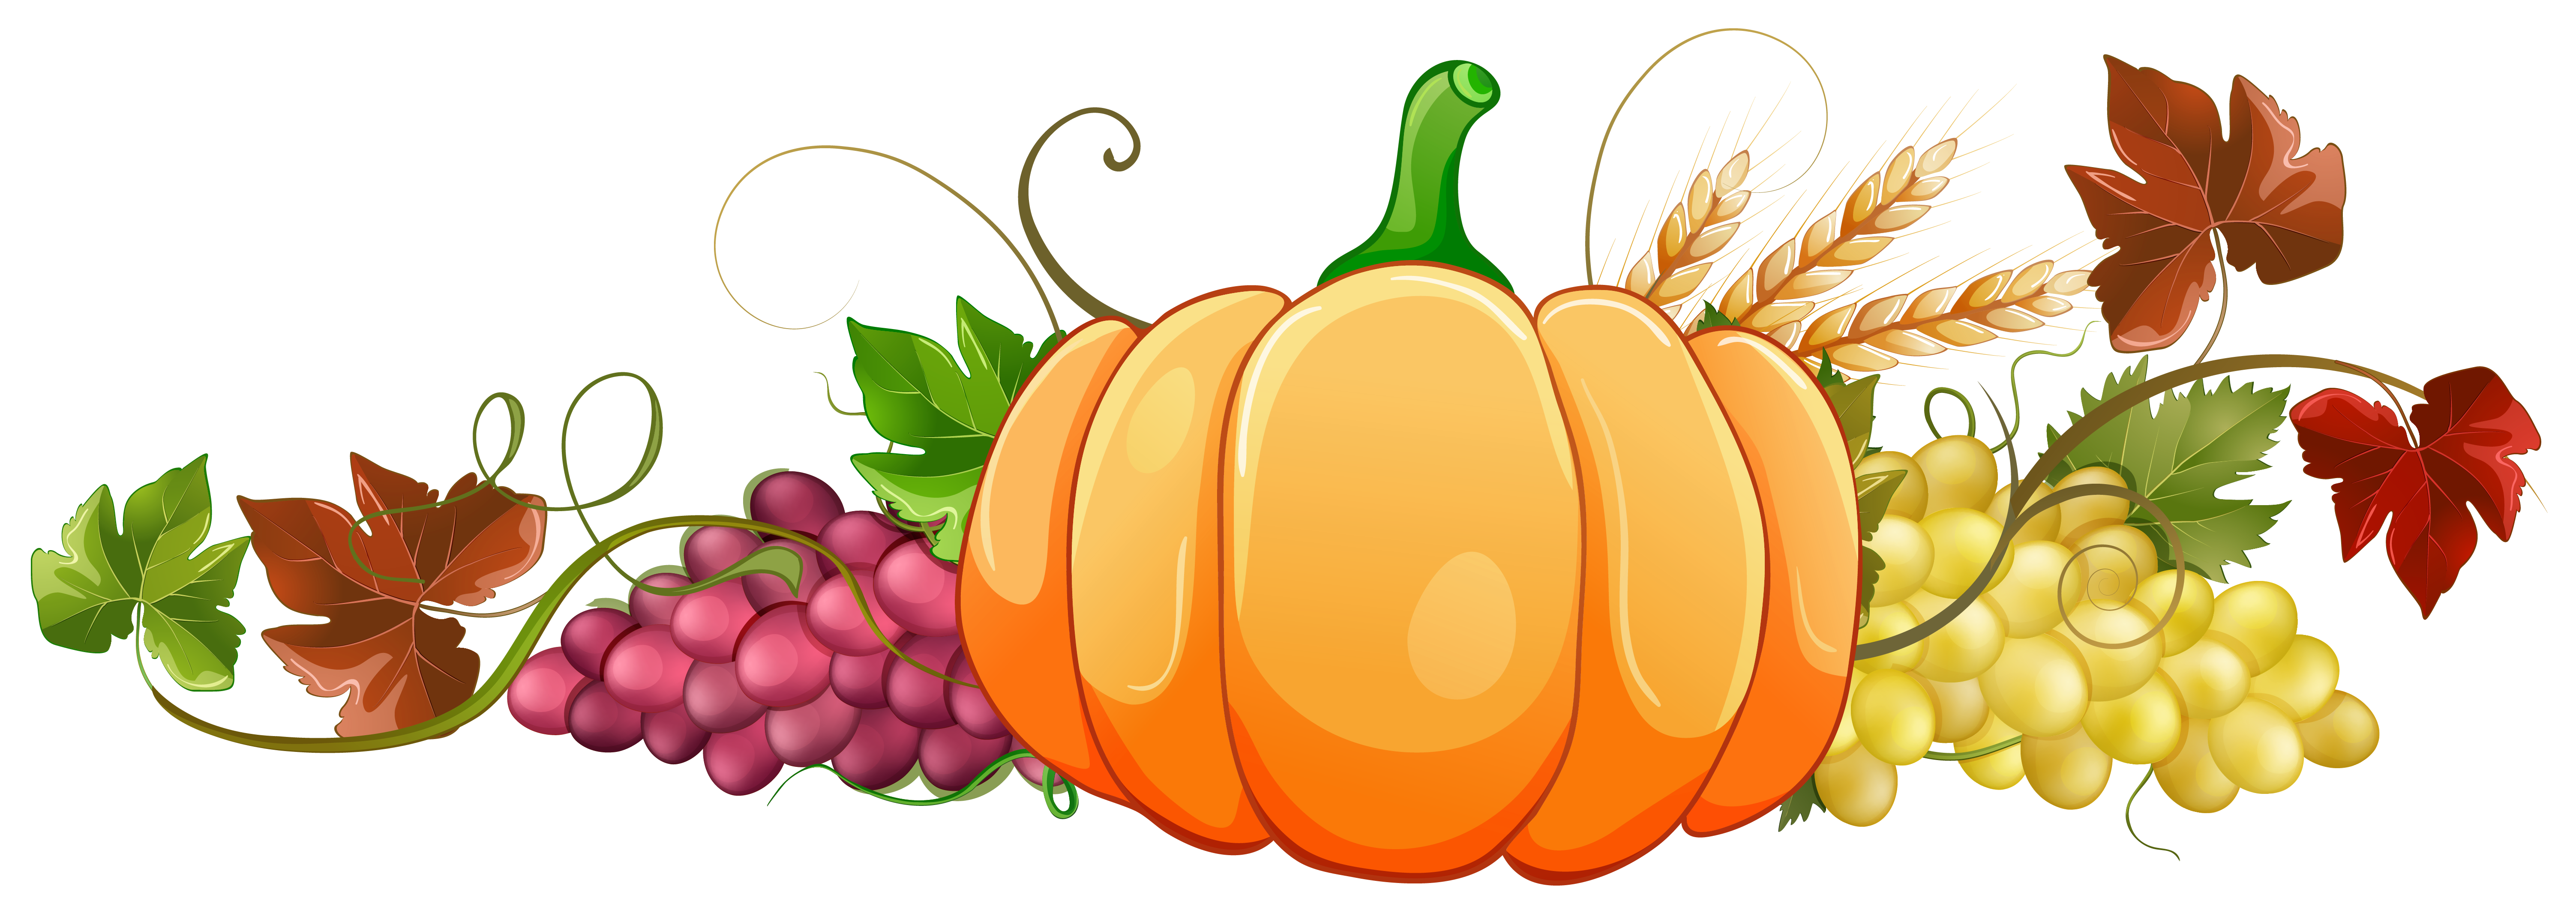 Pumpkin autumn squash gourd. Clipart winter soup